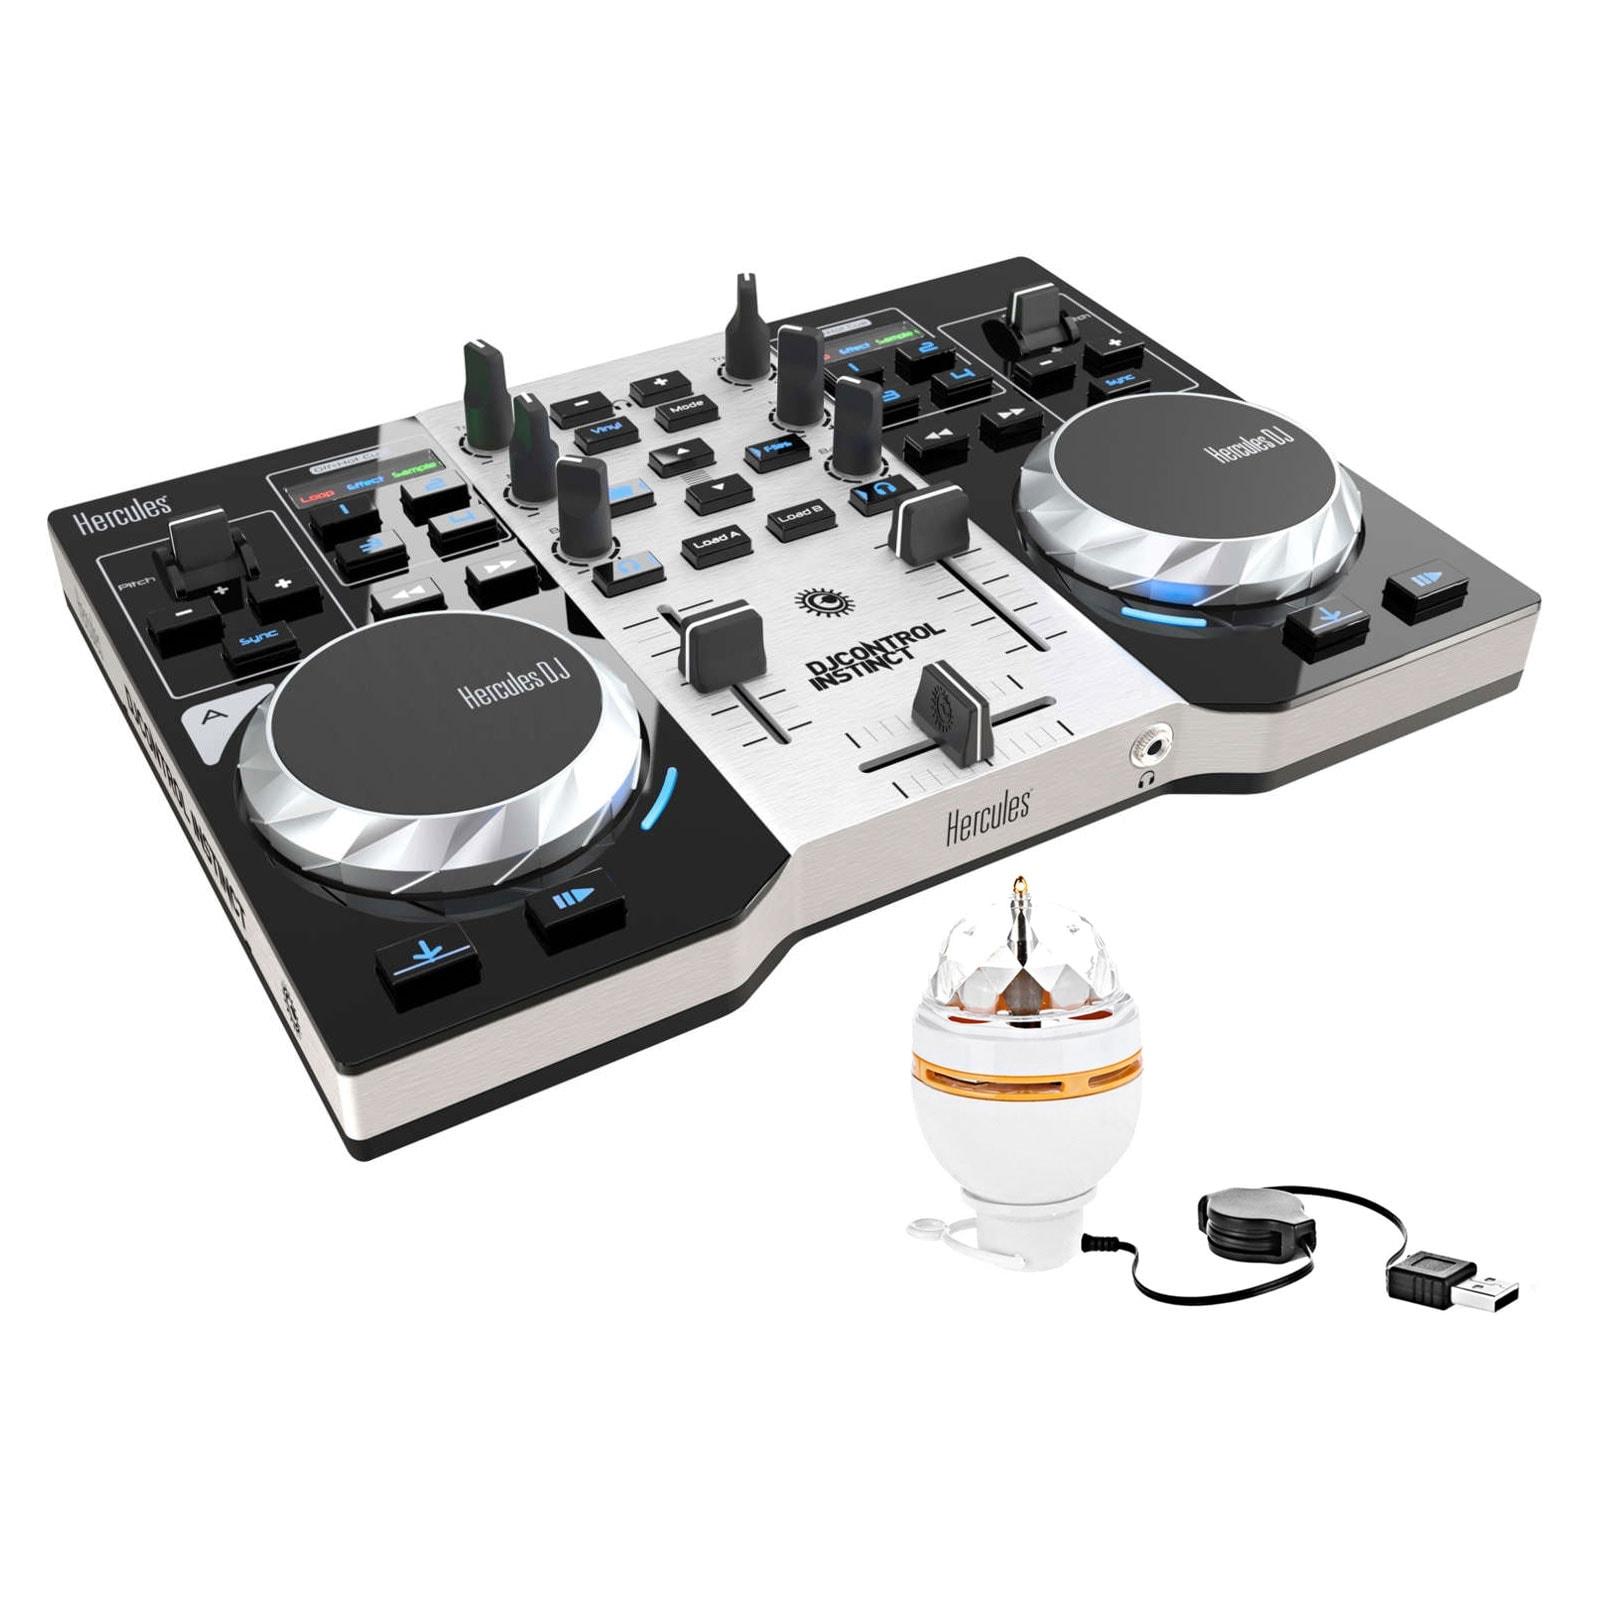 Hercules DJControl Instinct Party Pack - Table de mixage Hercules - 0